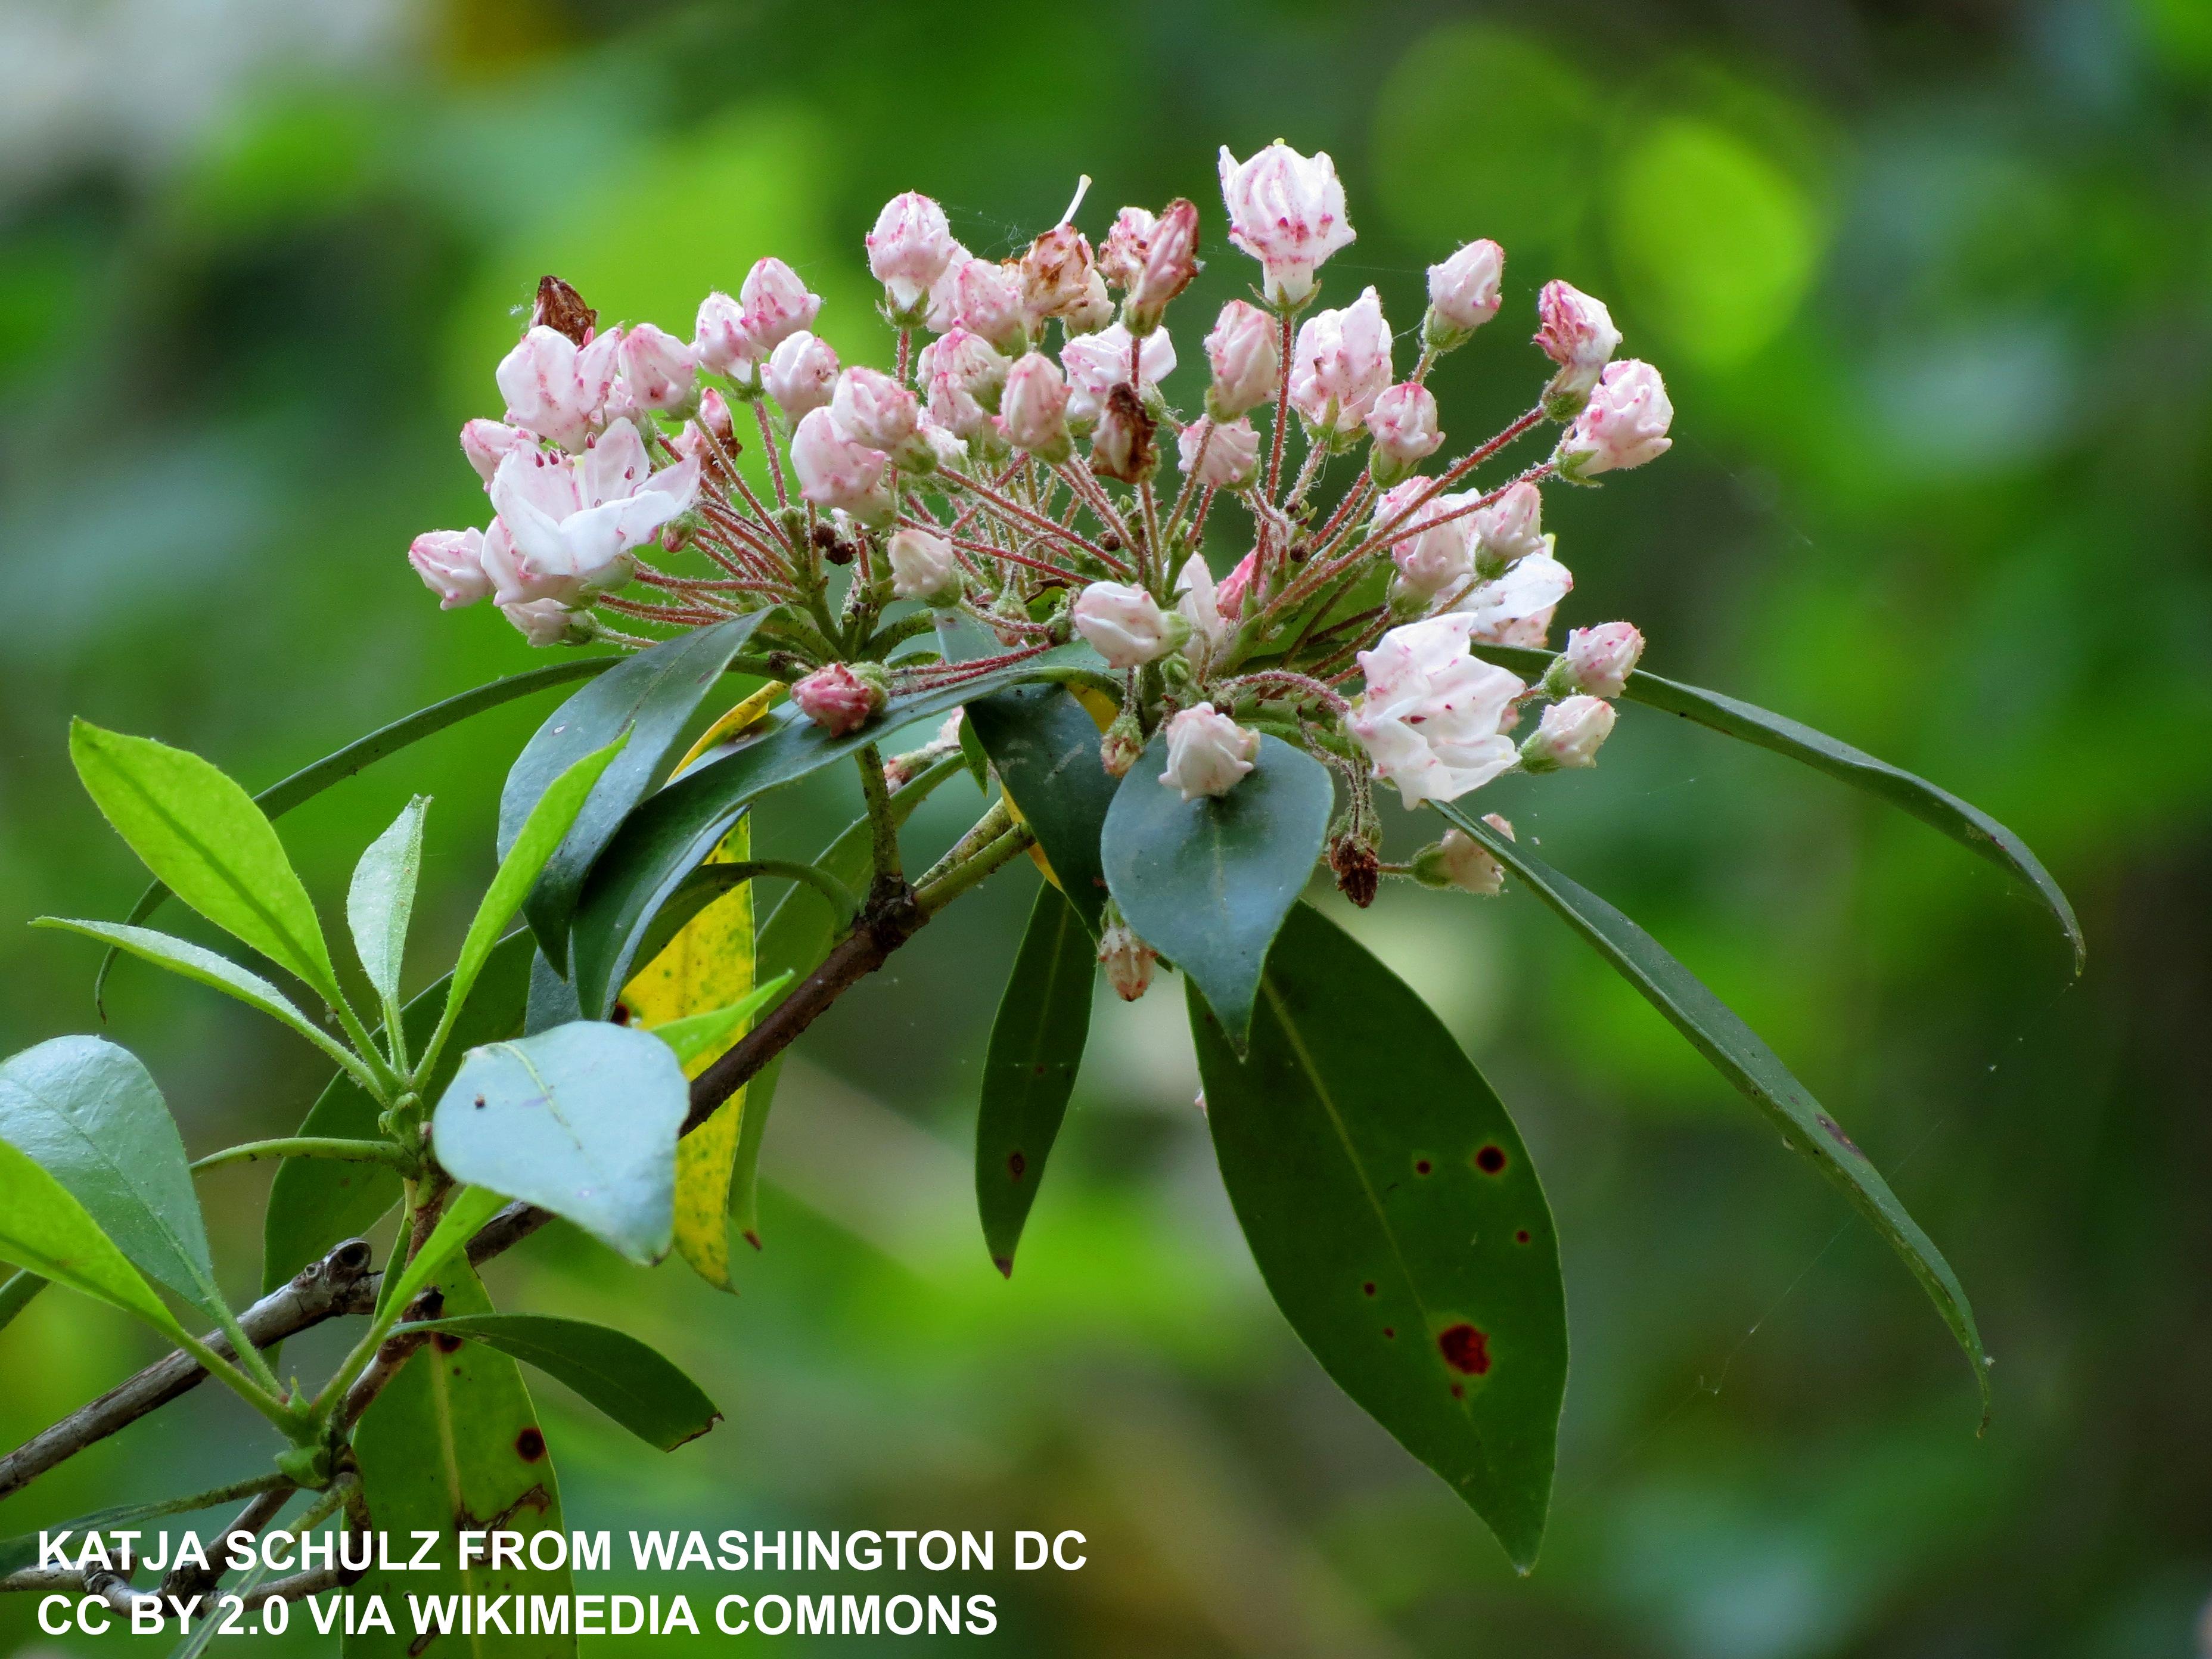 A bloom of light pink laurel flowers